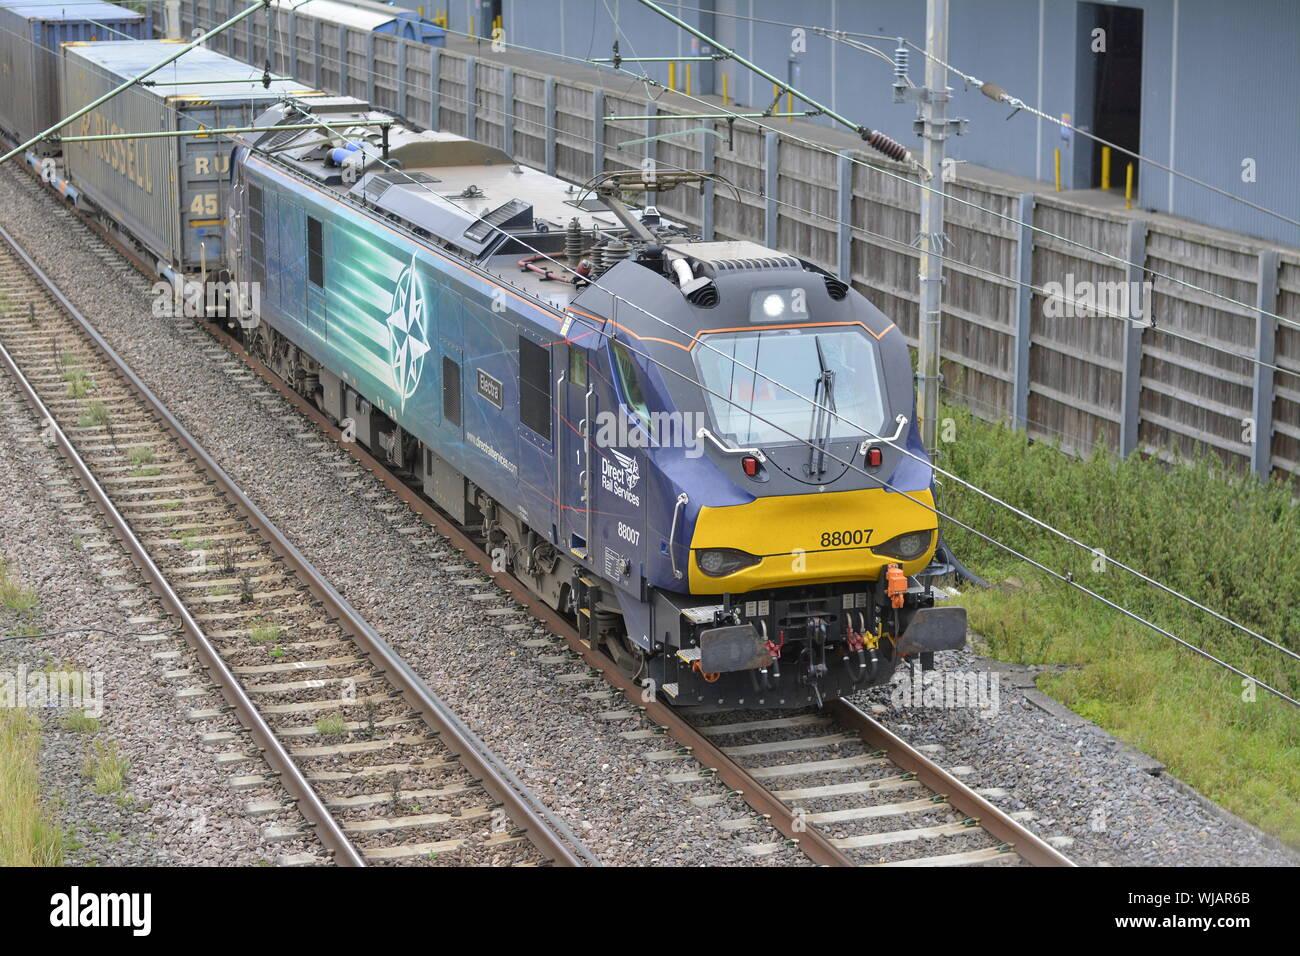 DRS Class 88 bimode locomotive 88007 Electra approaches Daventry International Rail Freight Terminal with an intermodal freight train Stock Photo